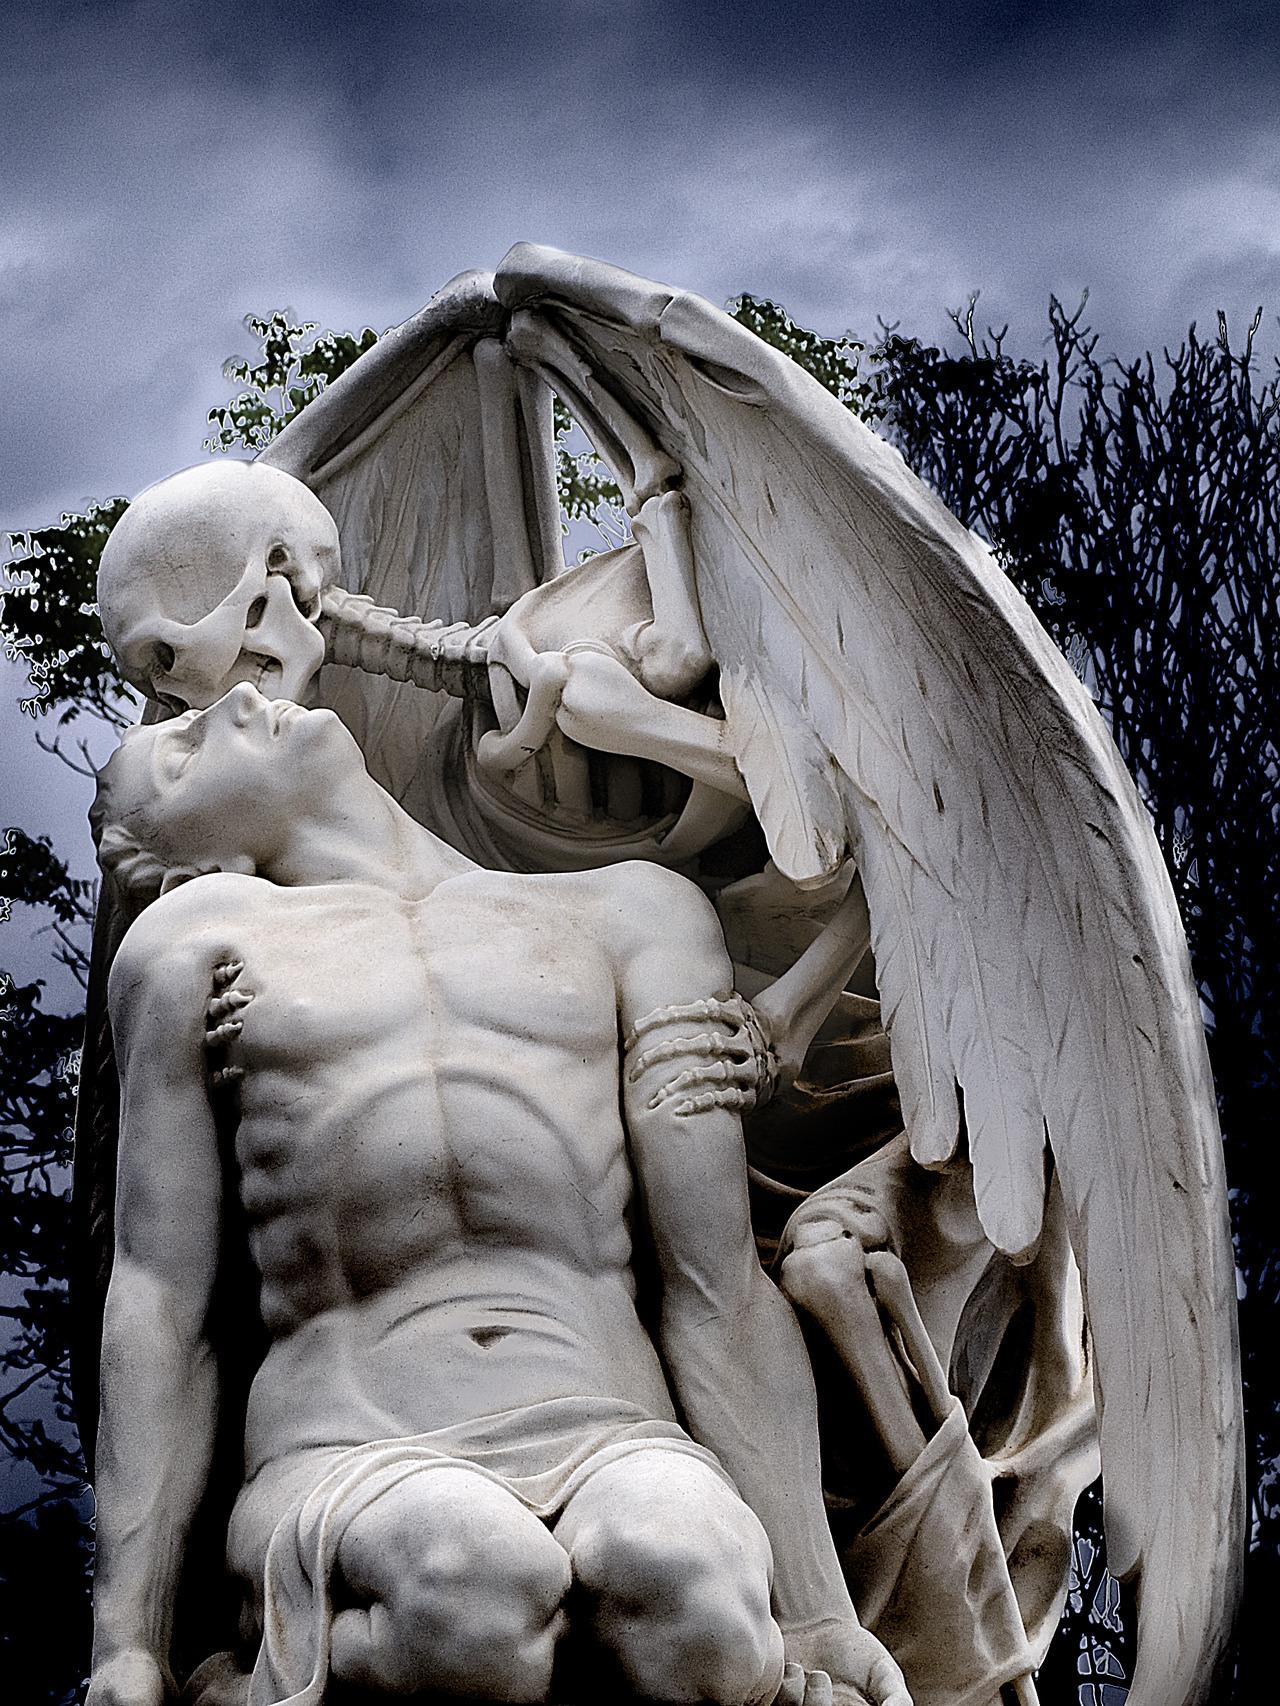 02. The Kiss Of Death, Poblenou Cemetery, Barcelona, Spain